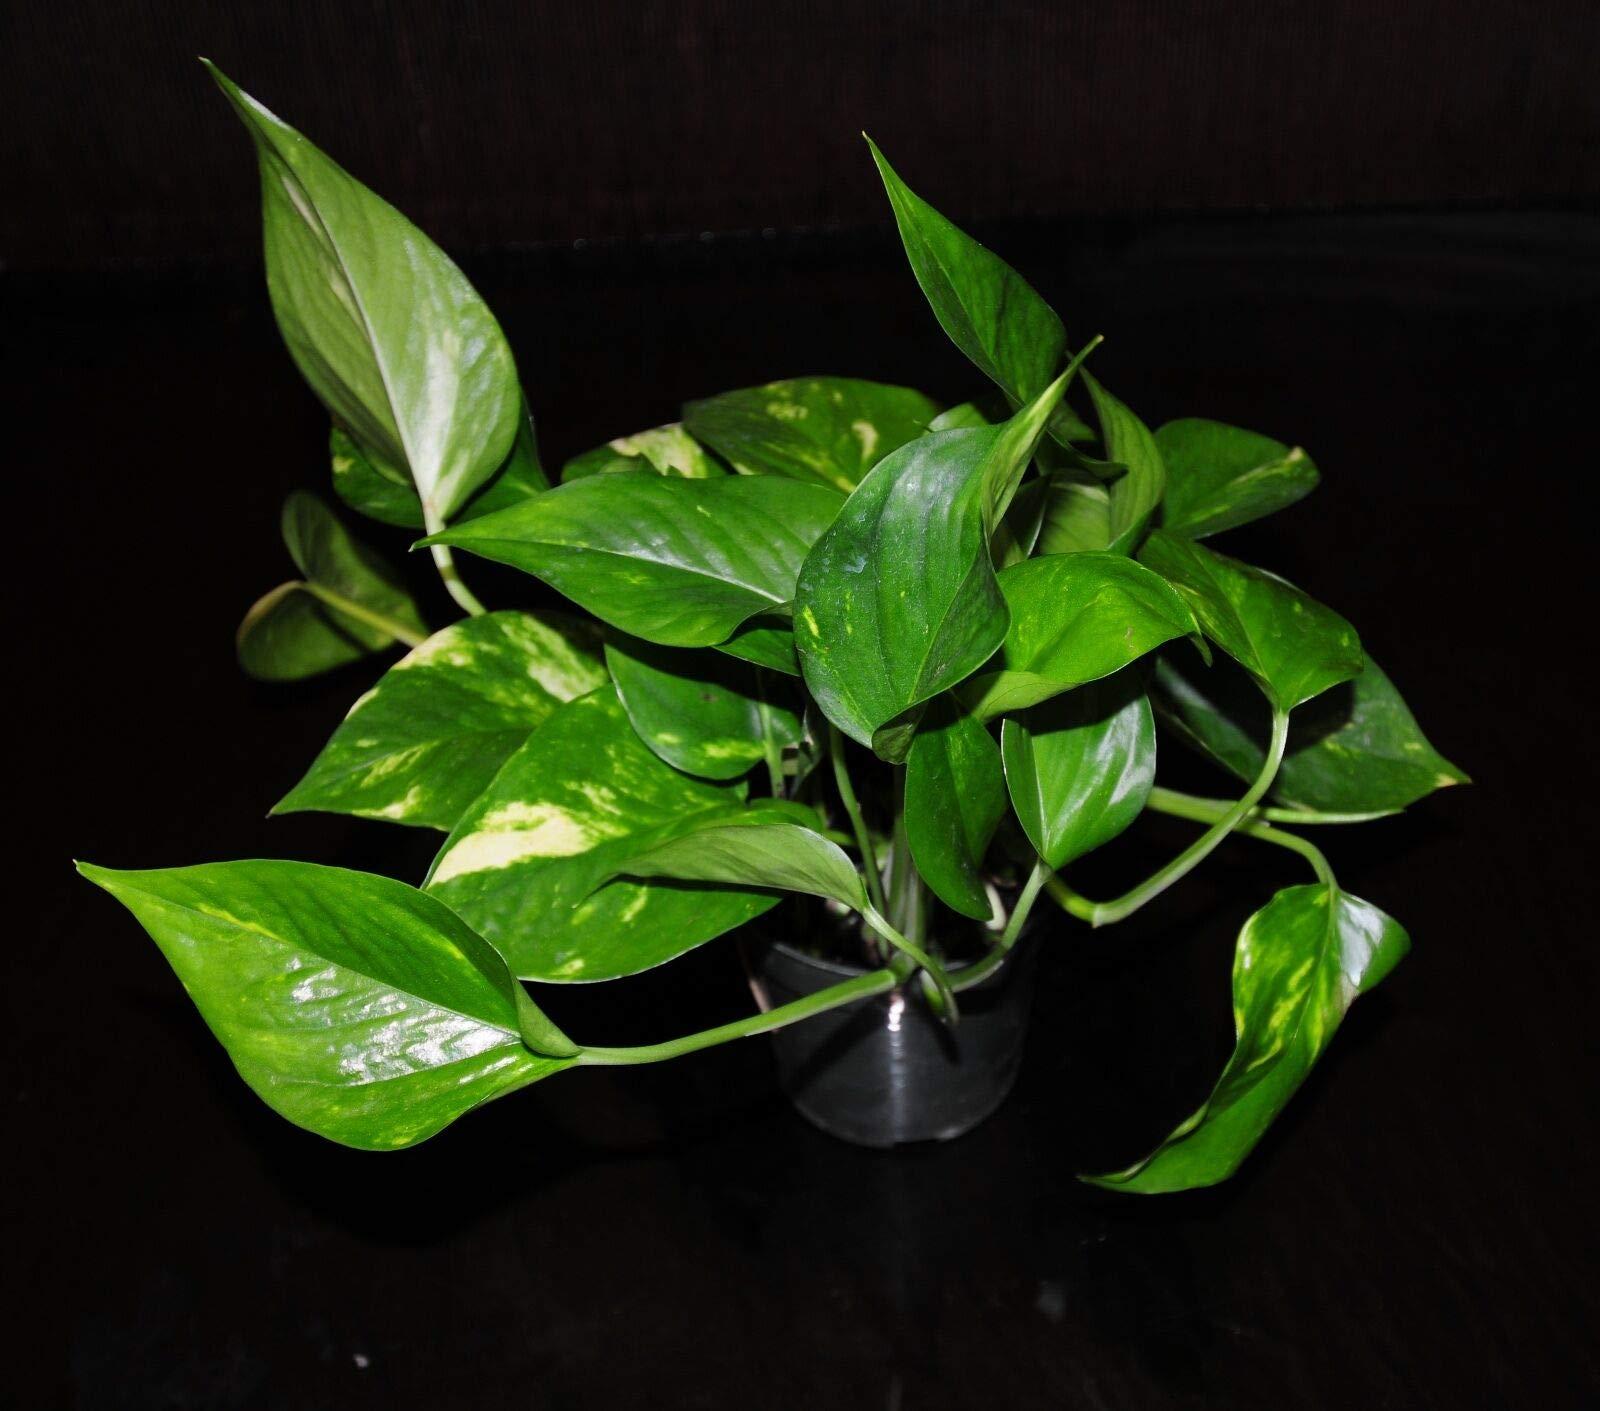 Golden Pothos 4'' Pots Easy Tropical Vining House Plant Super Large & Full (Premium Quality) by AY-Premium